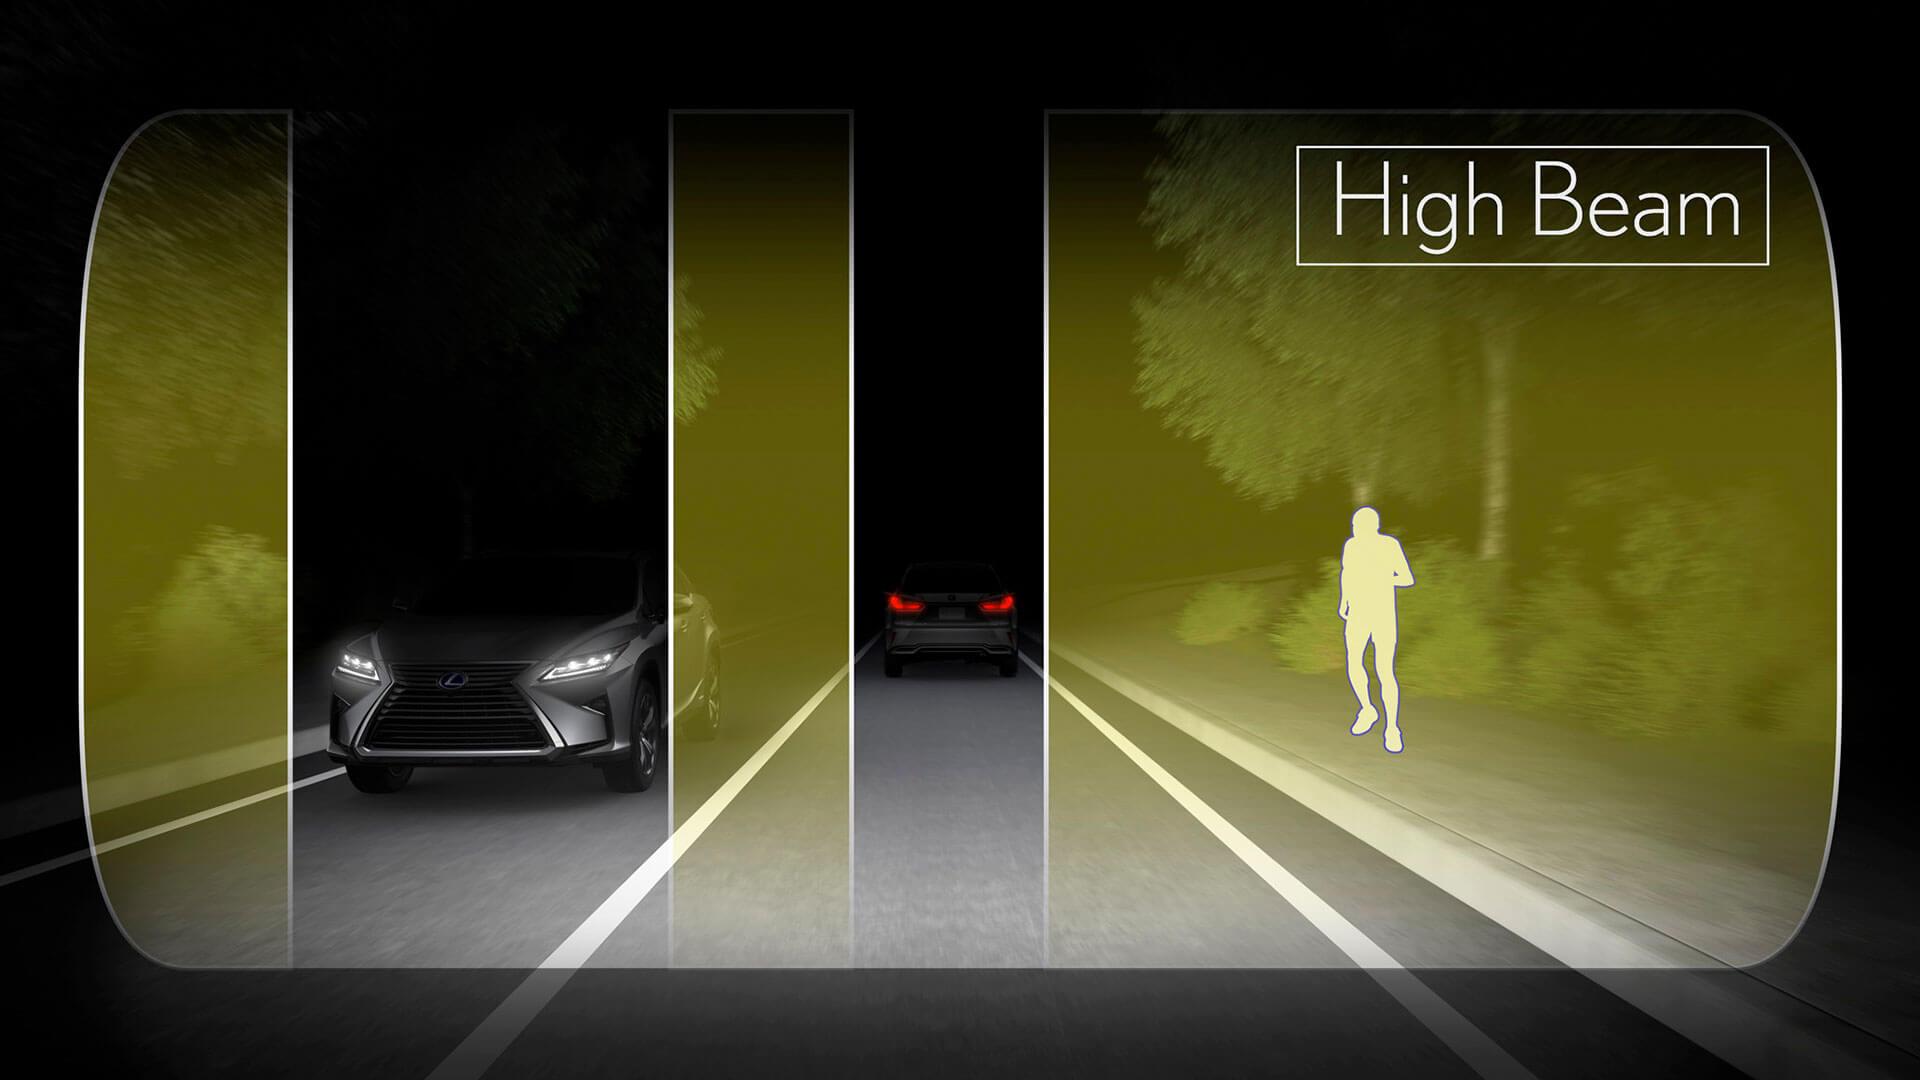 2017 lexus rx 200t features high beam